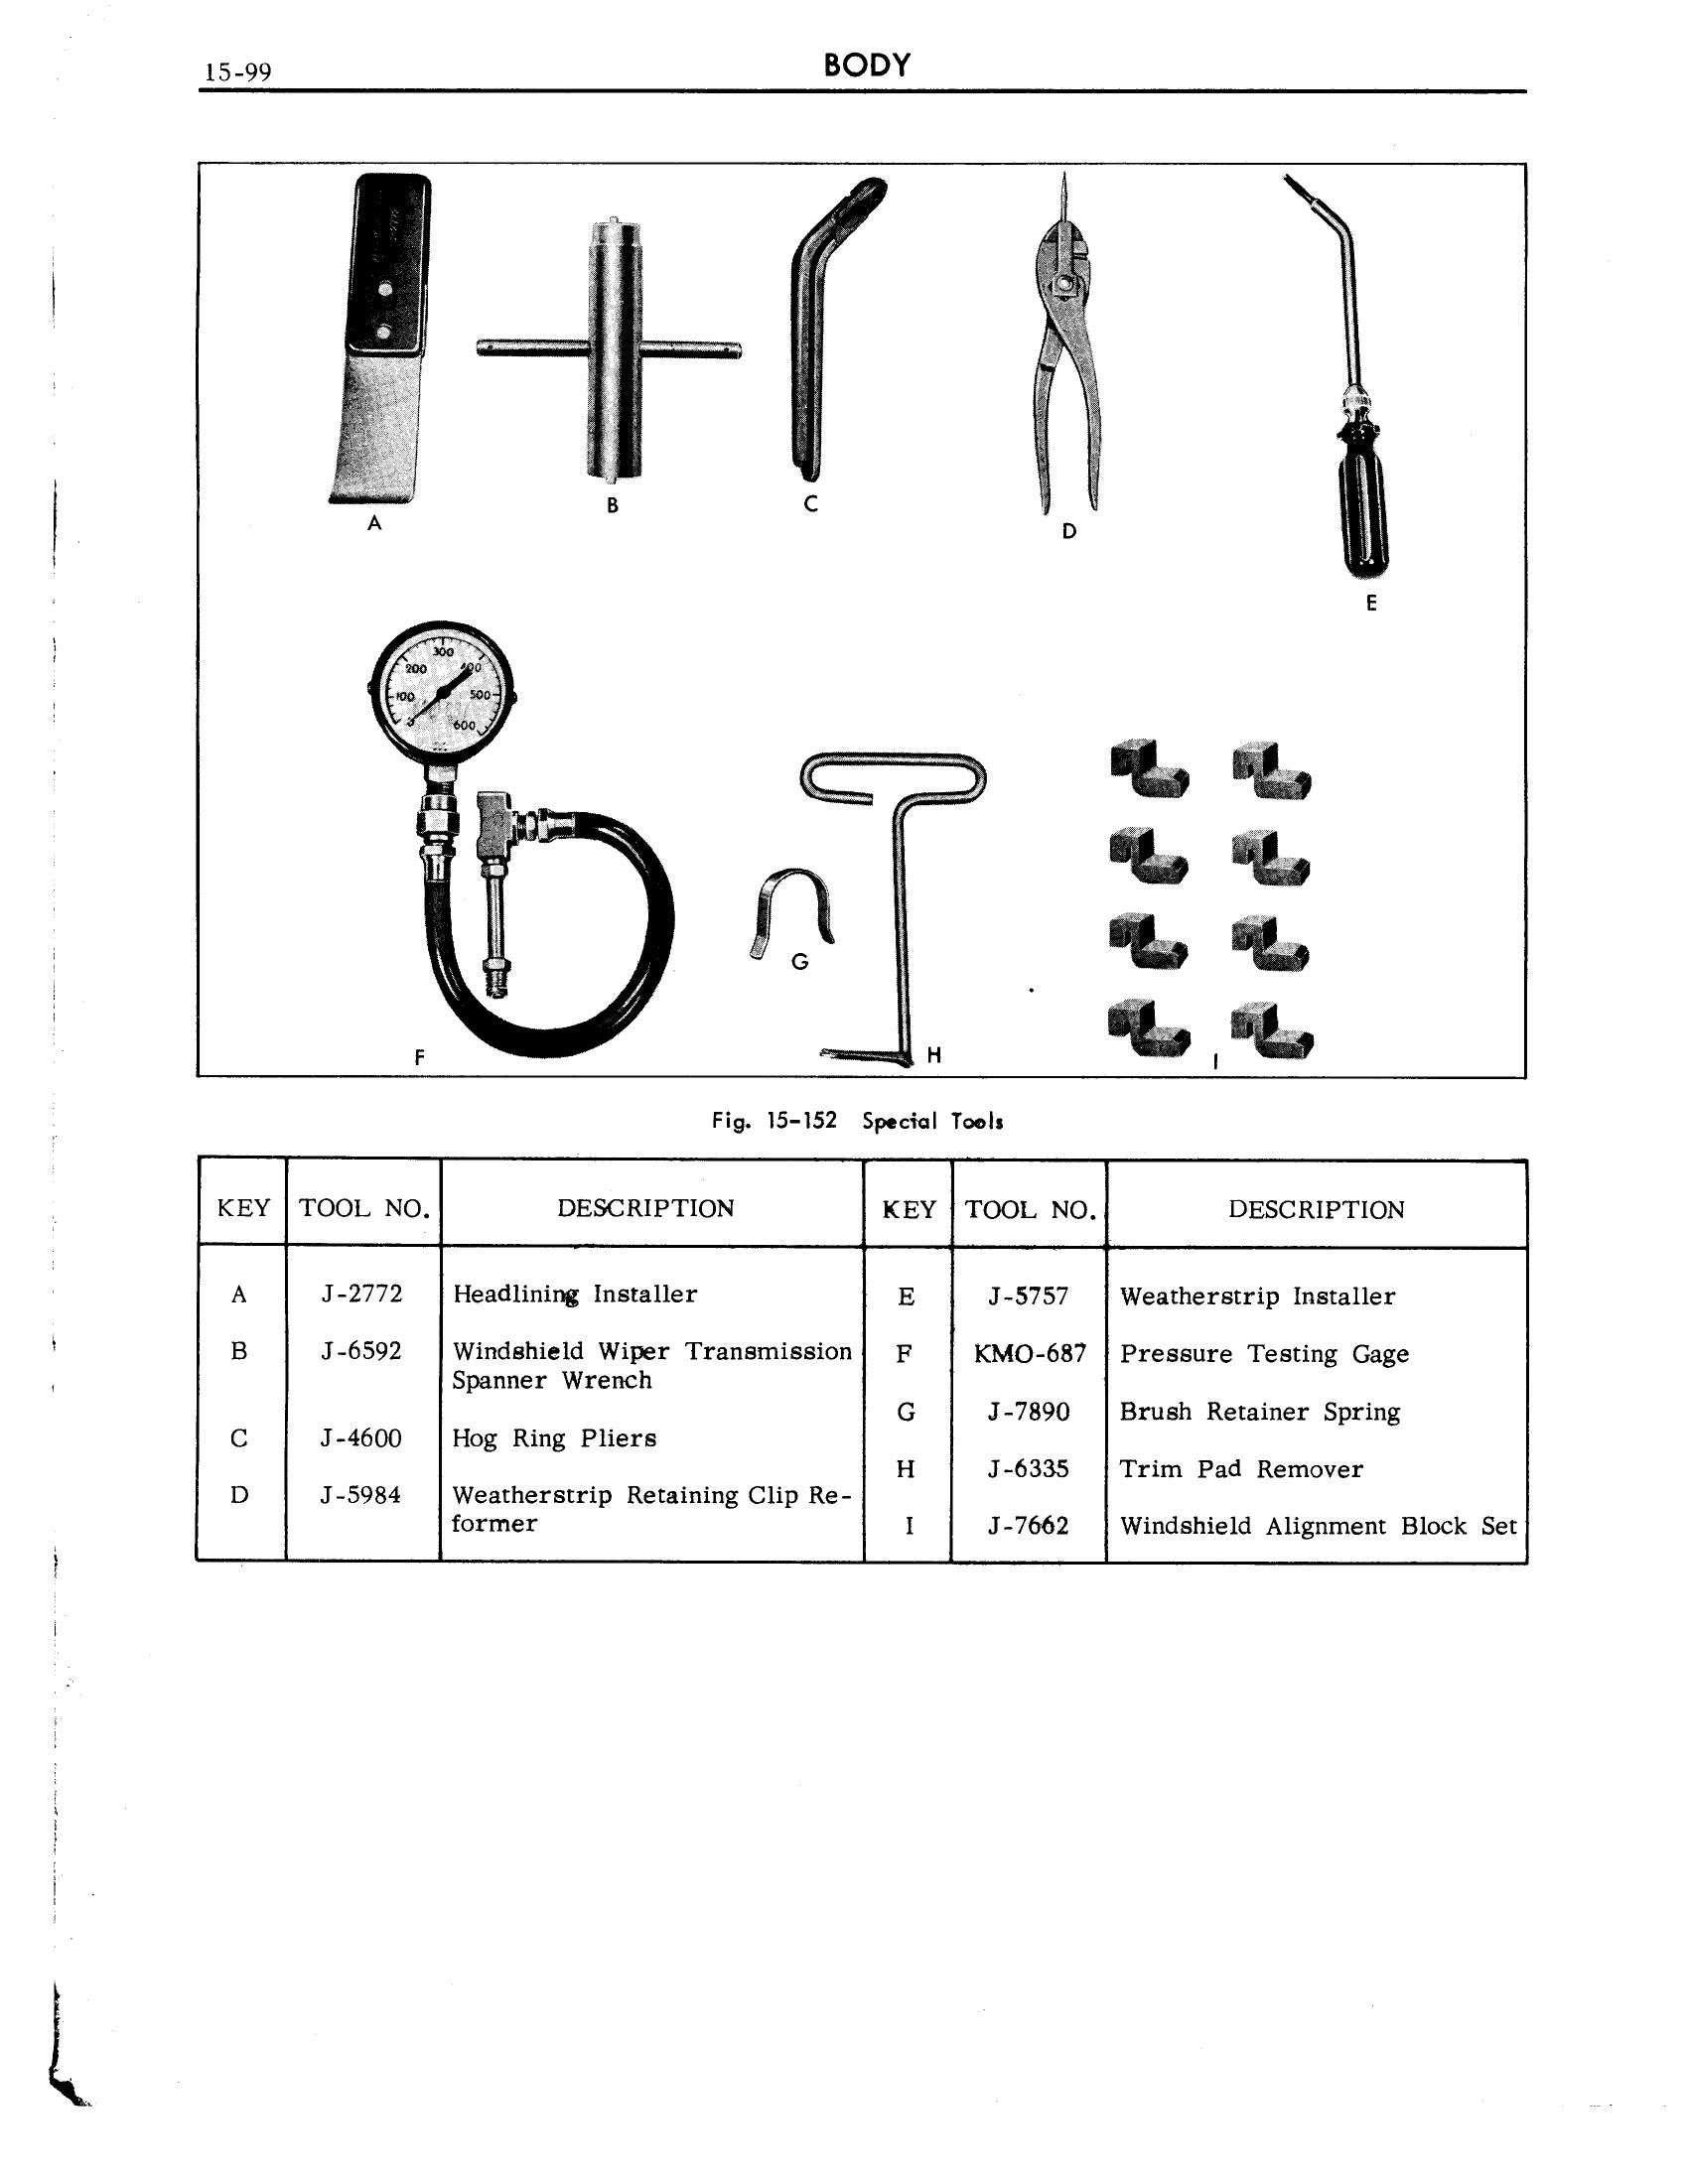 1959 Cadillac Shop Manual- Body Page 99 of 99